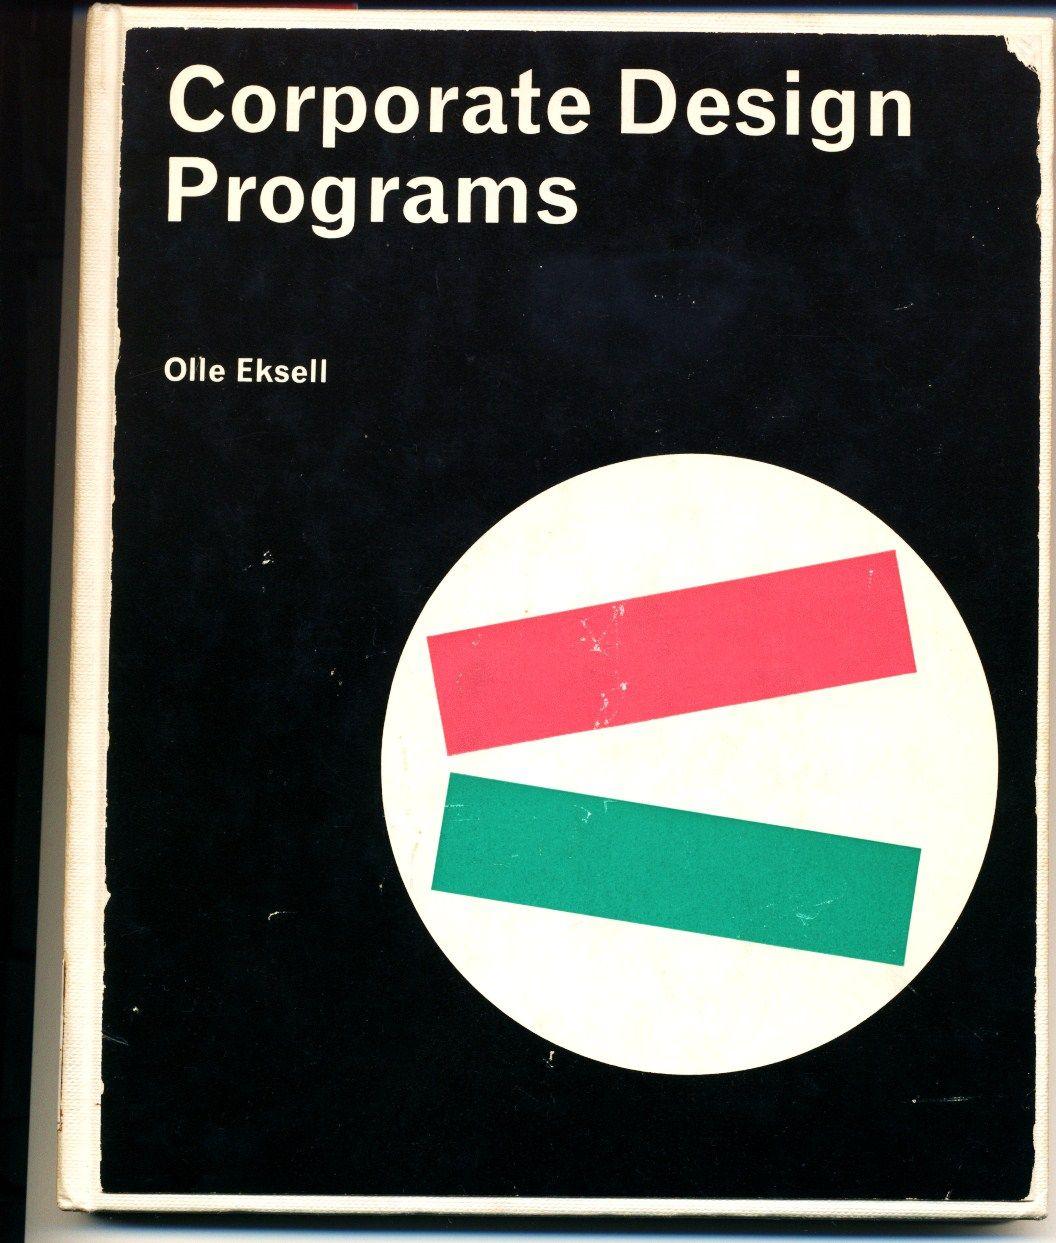 Corporate Design Programs - Olle Eksell